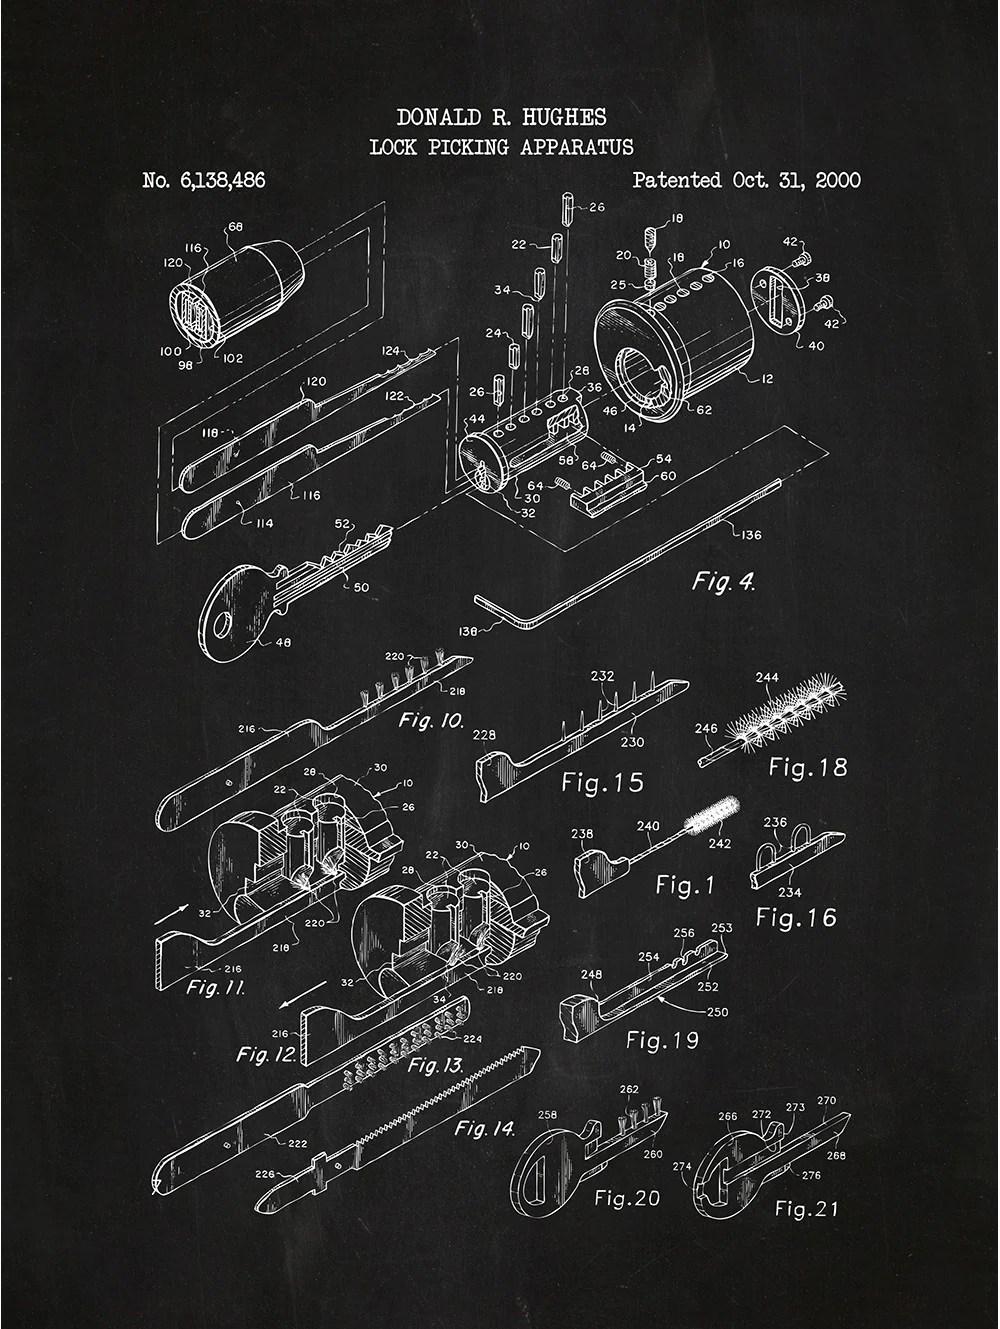 small resolution of lock picking apparatus donald r hughes 2000